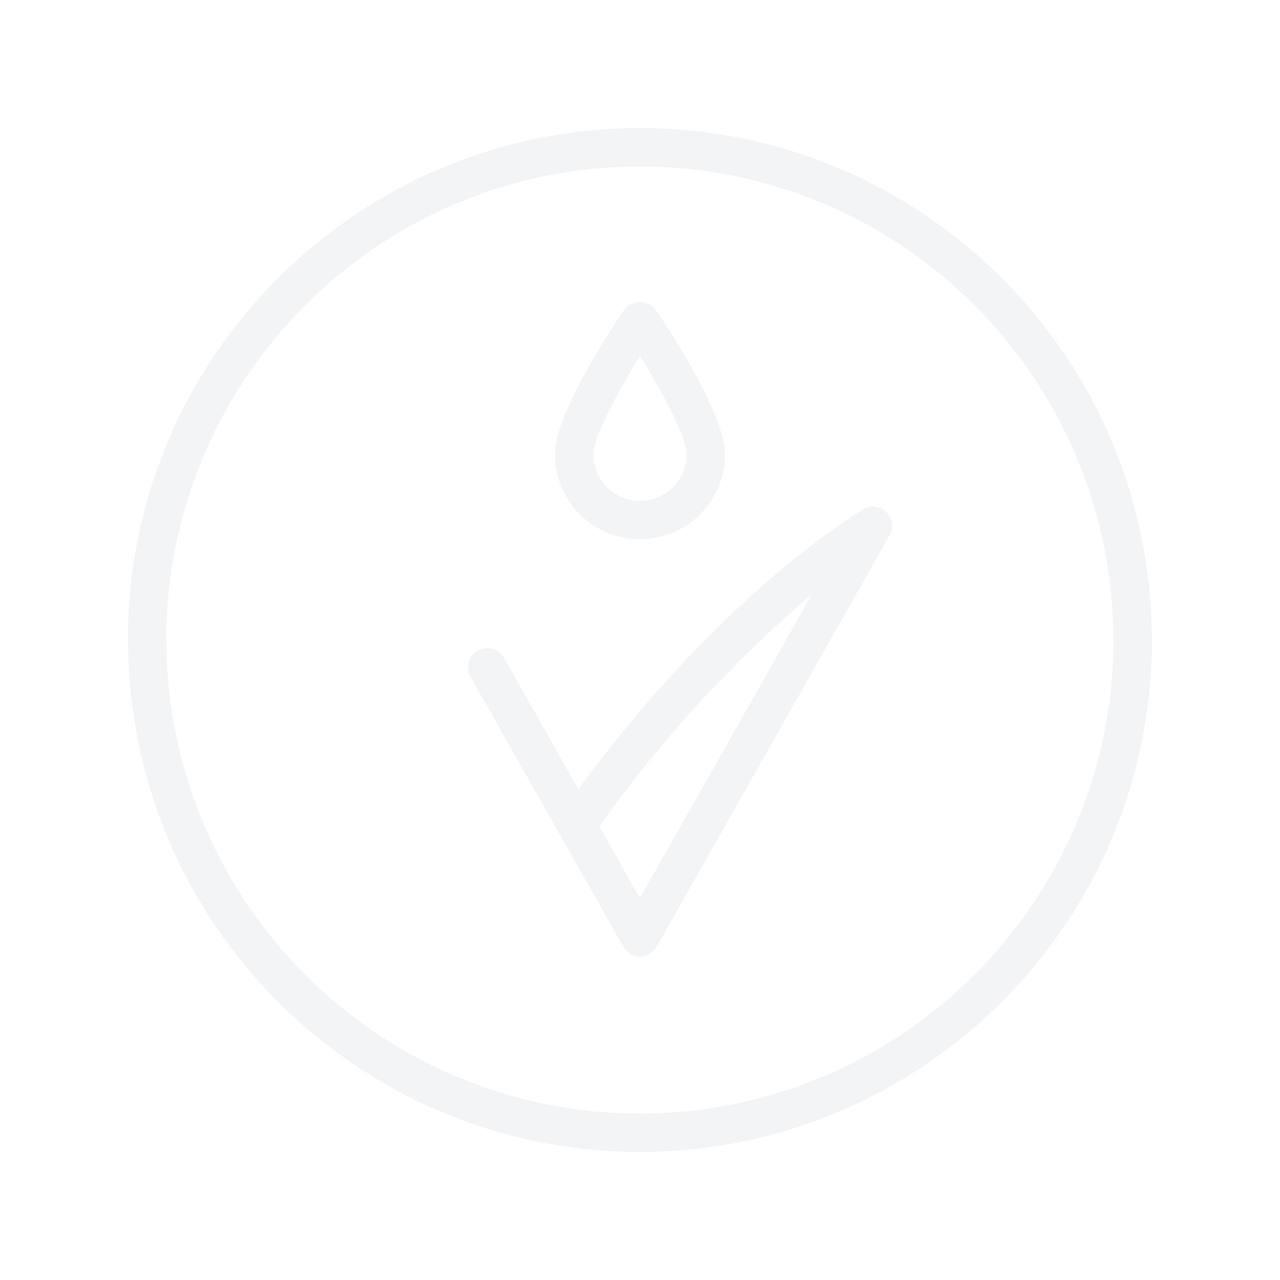 Clarins Super Restorative Night Replenishing Cream (All Skins) 50ml